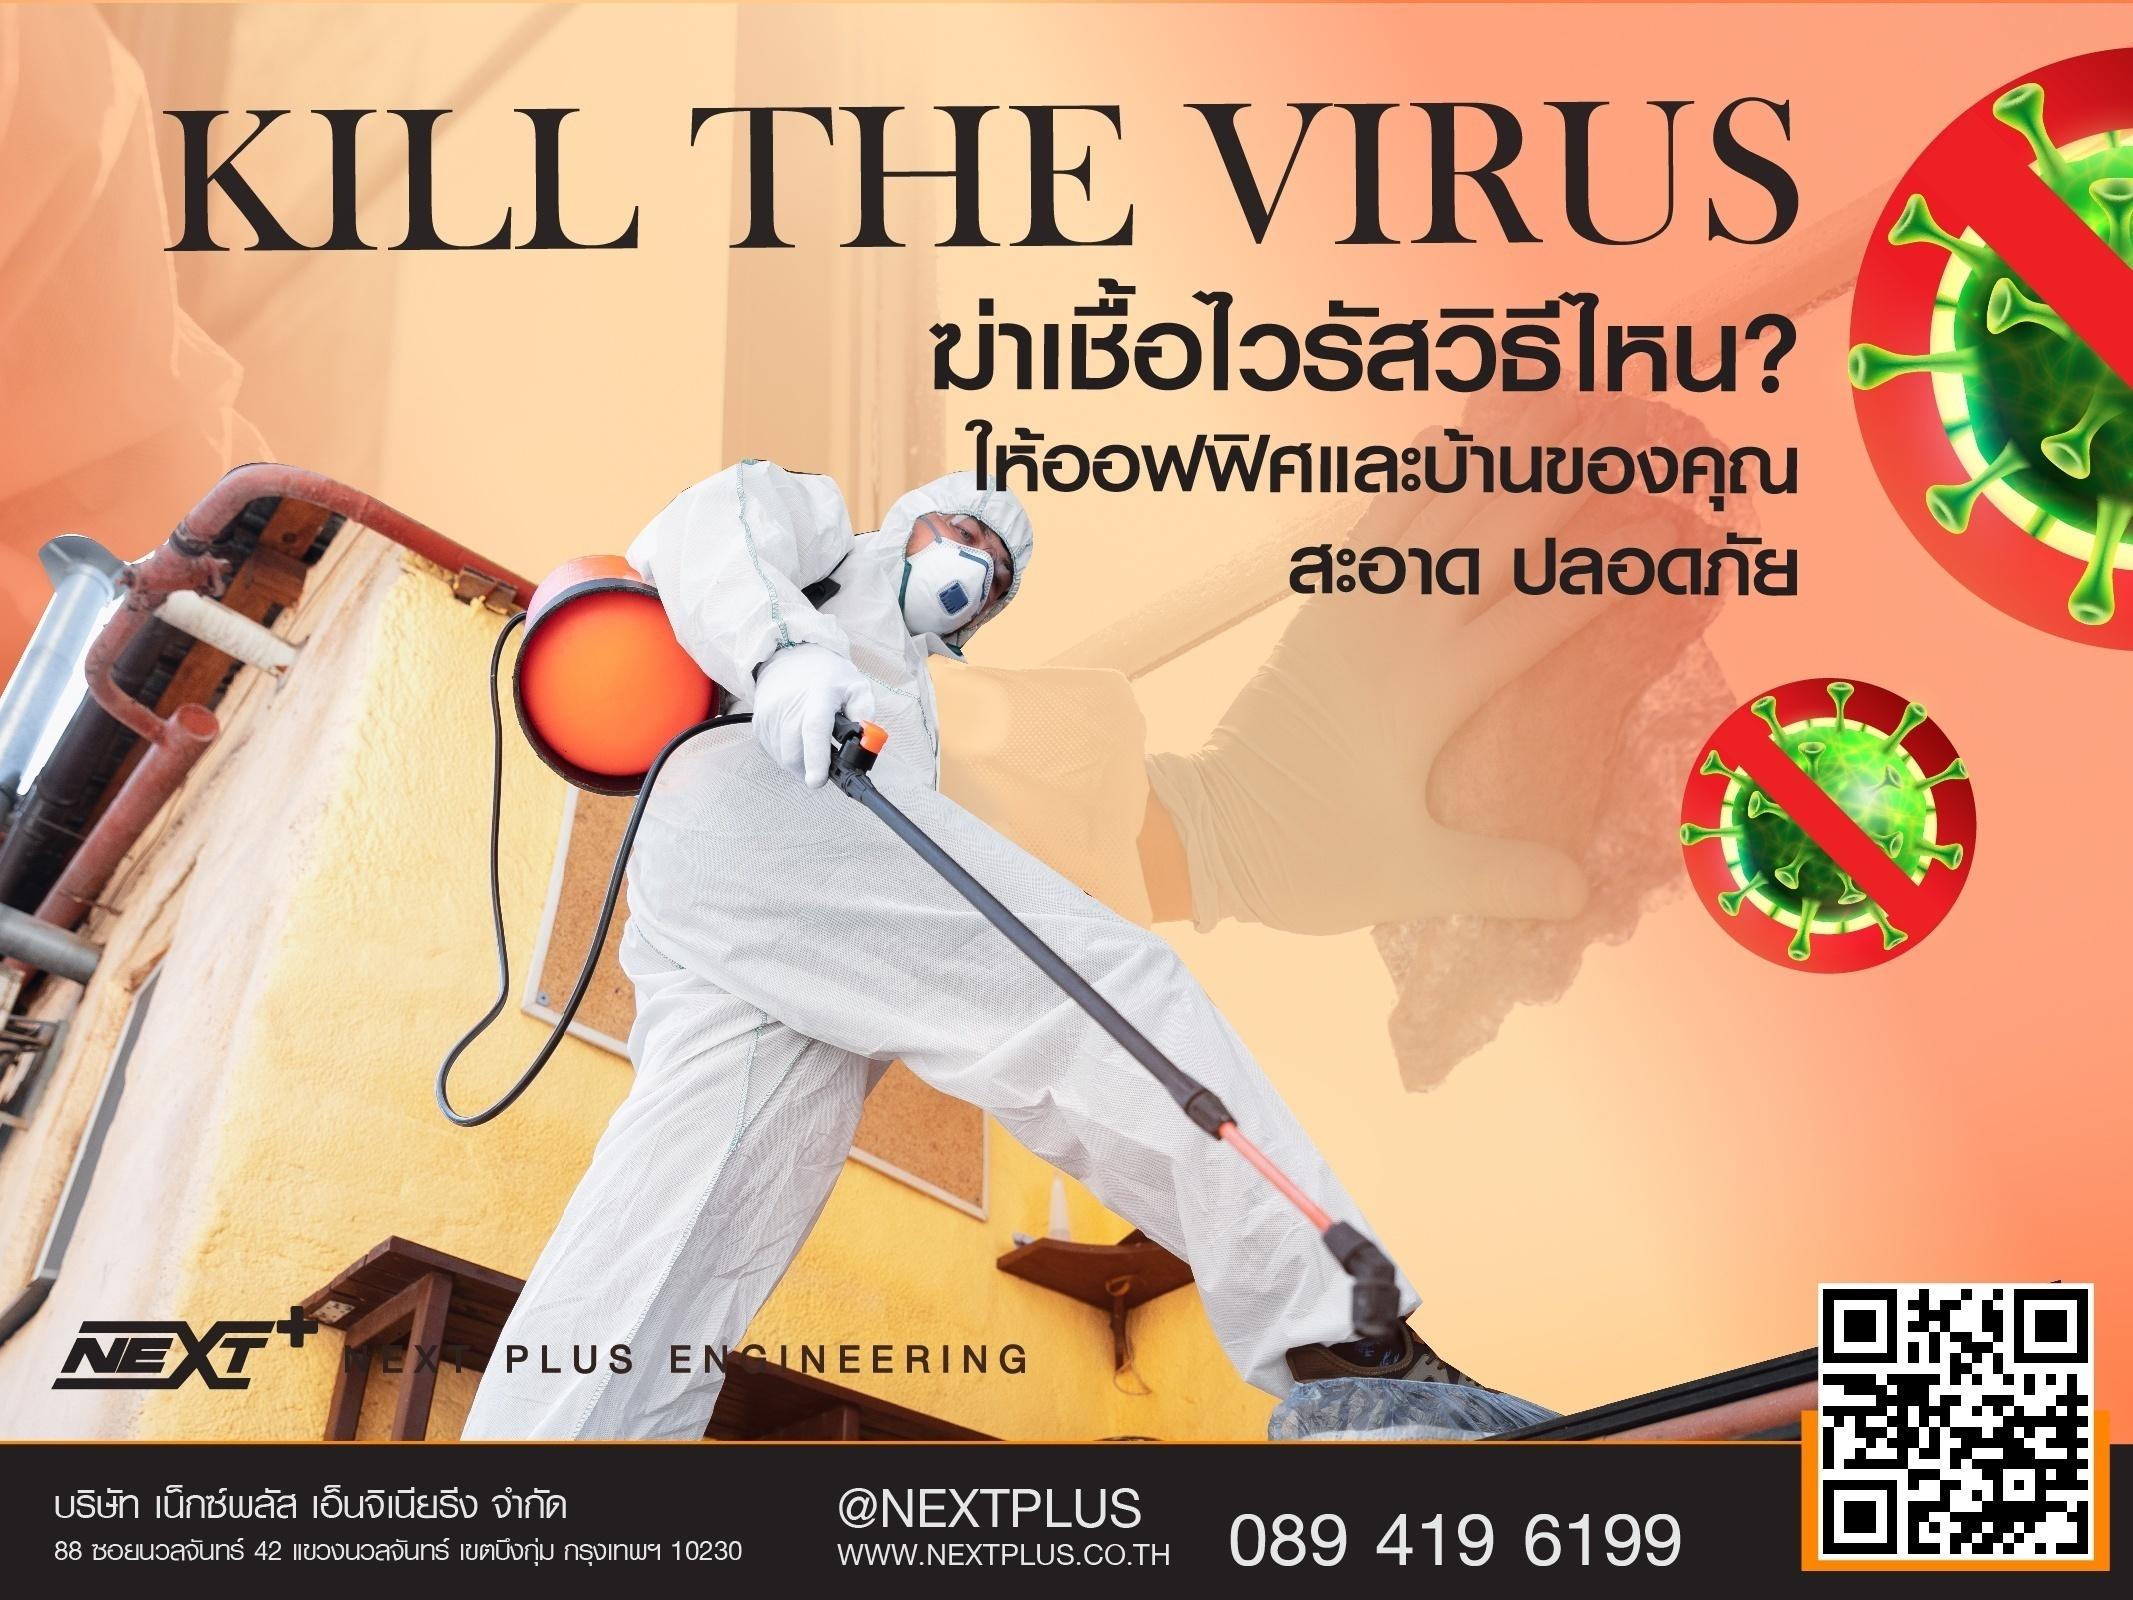 kill the virus-Next Plus Engineering-01